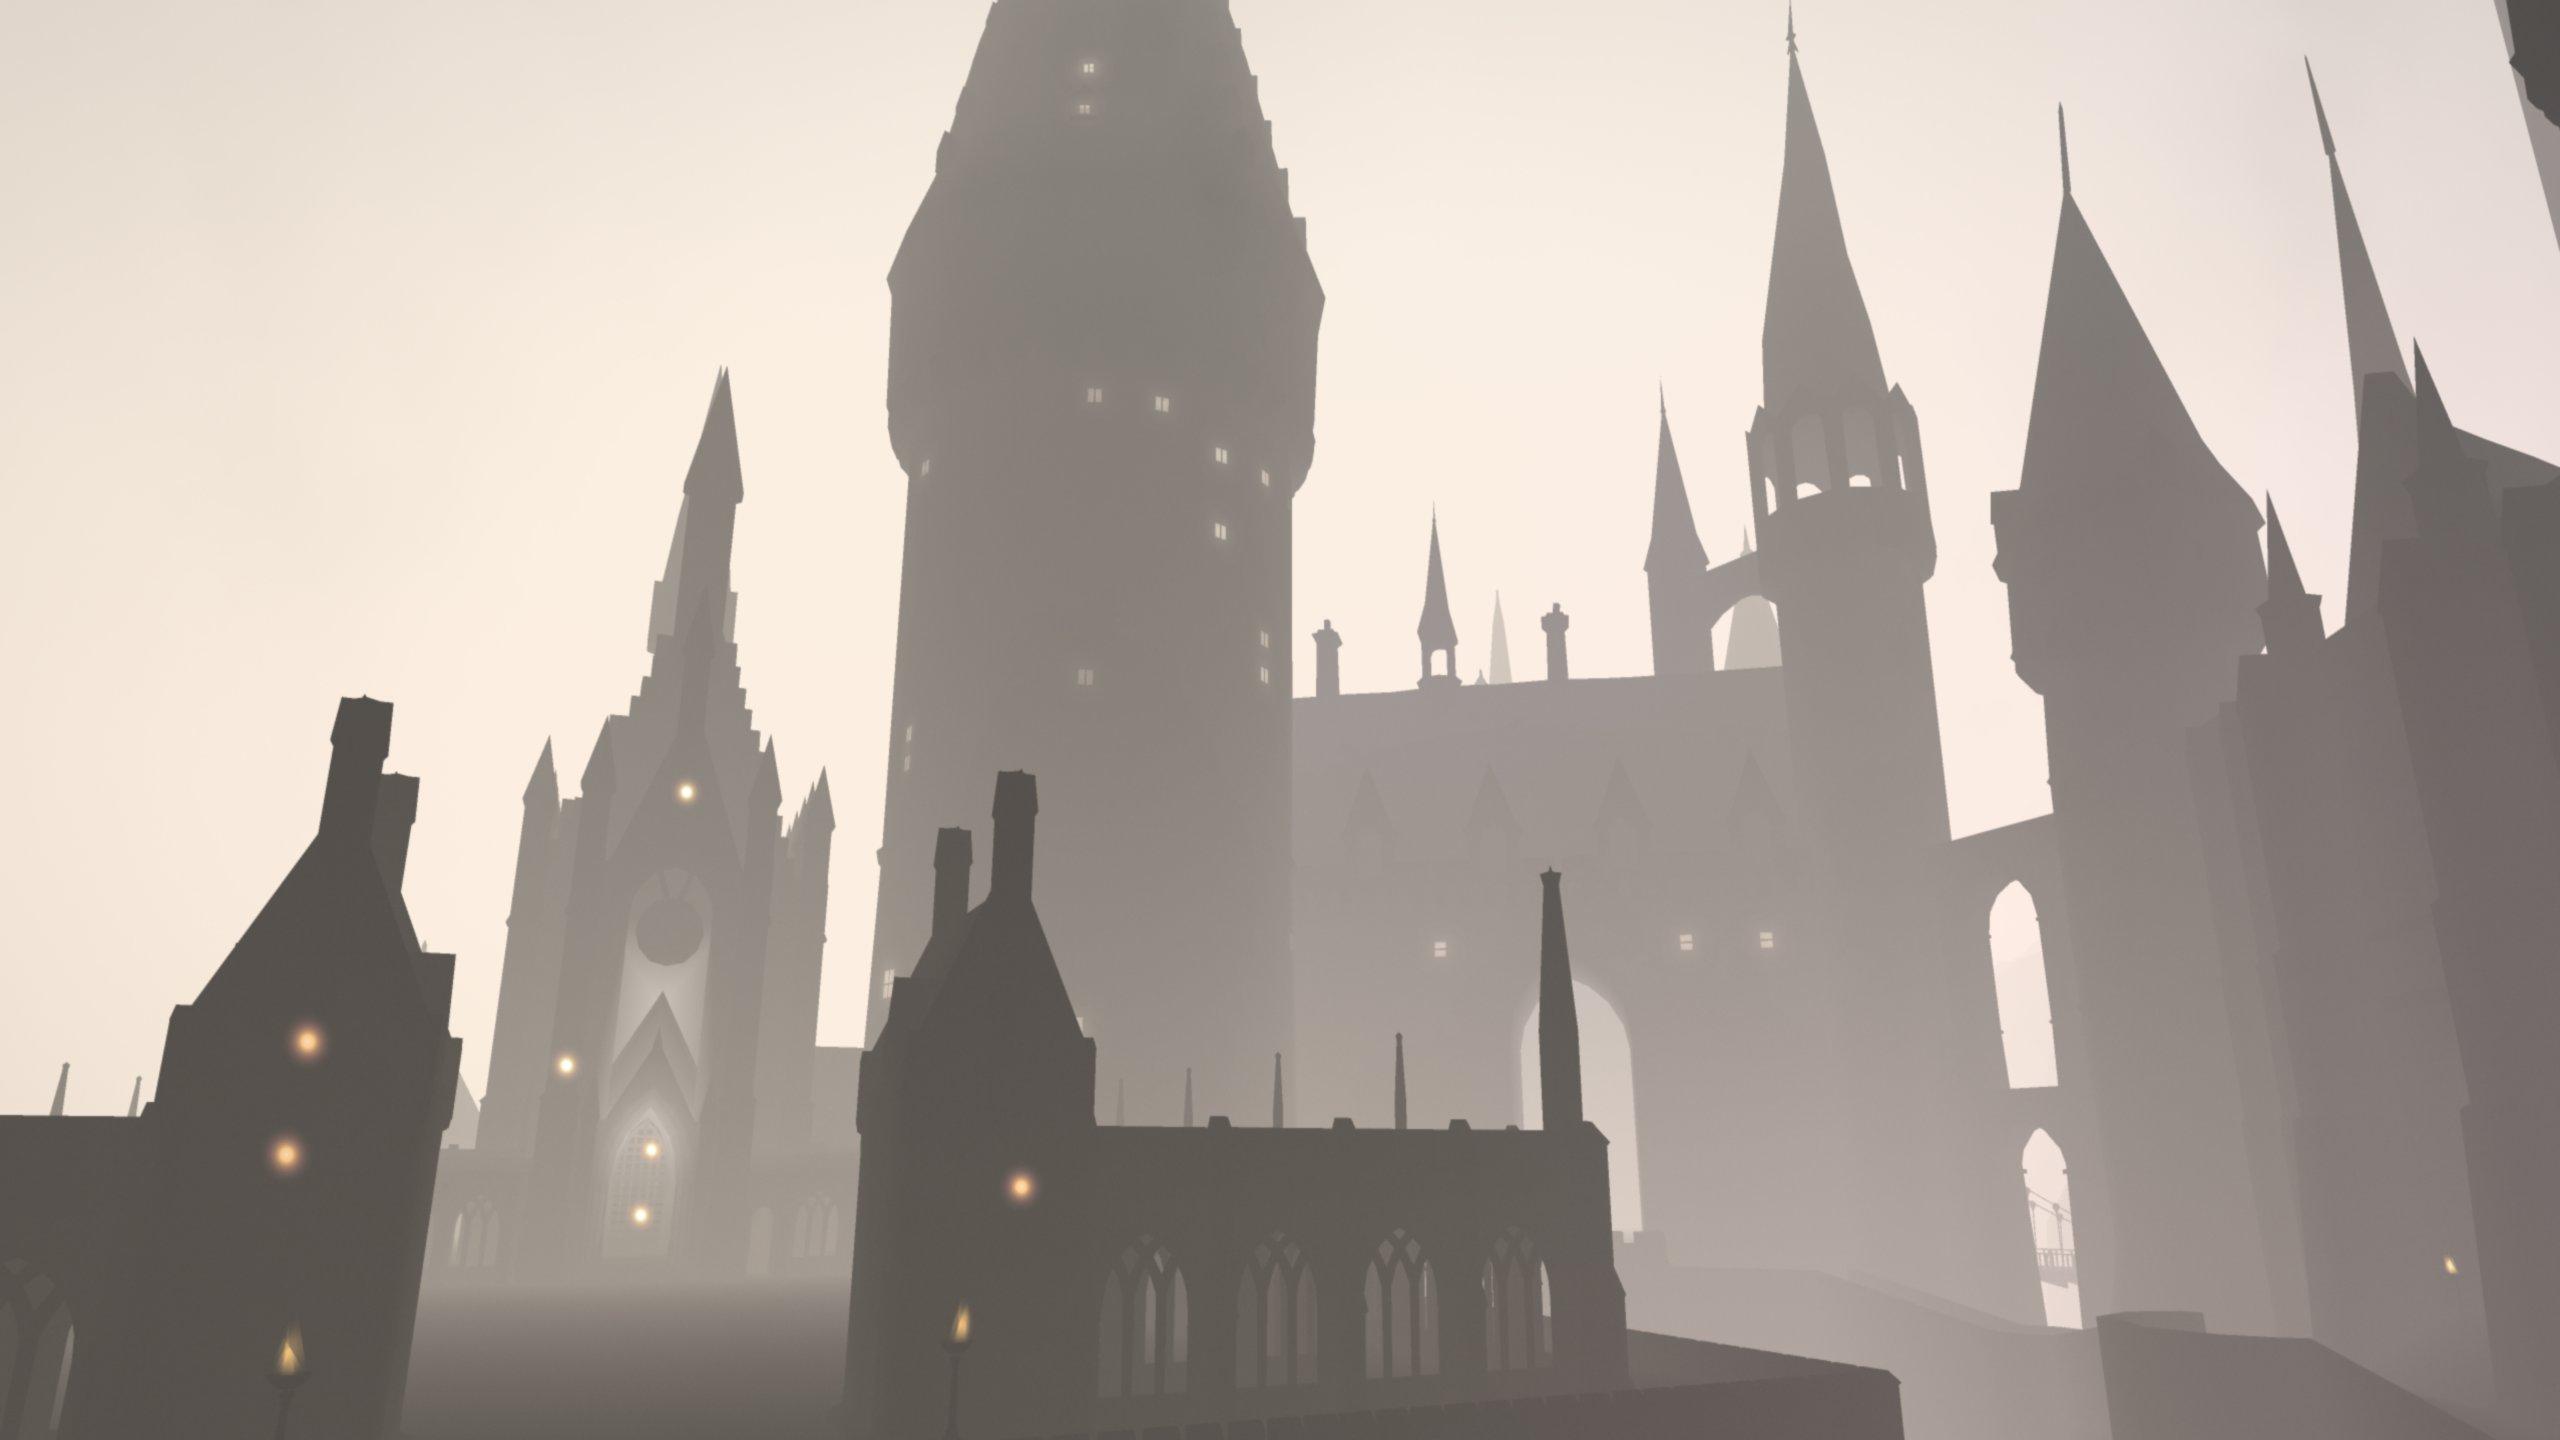 Harry Potter Pottermore Explore Hogwarts S Wallpaper - Minimalist Harry Potter Desktop Wallpaper Hd - HD Wallpaper